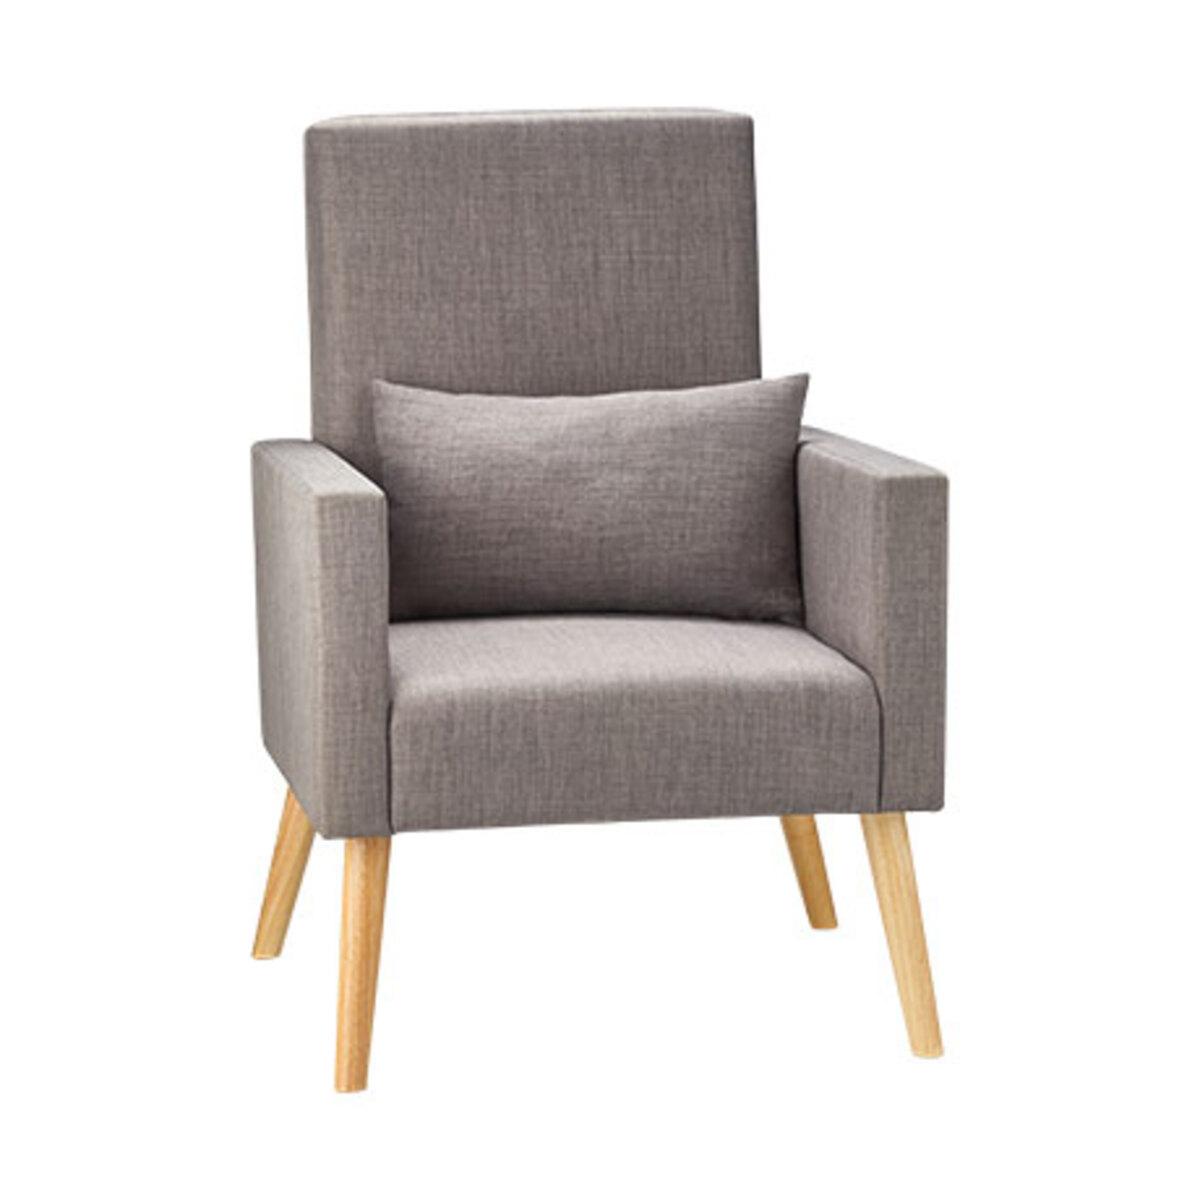 Bild 3 von 2-in-1 Schaukelstuhl-Sessel inkl. Zierkissen1